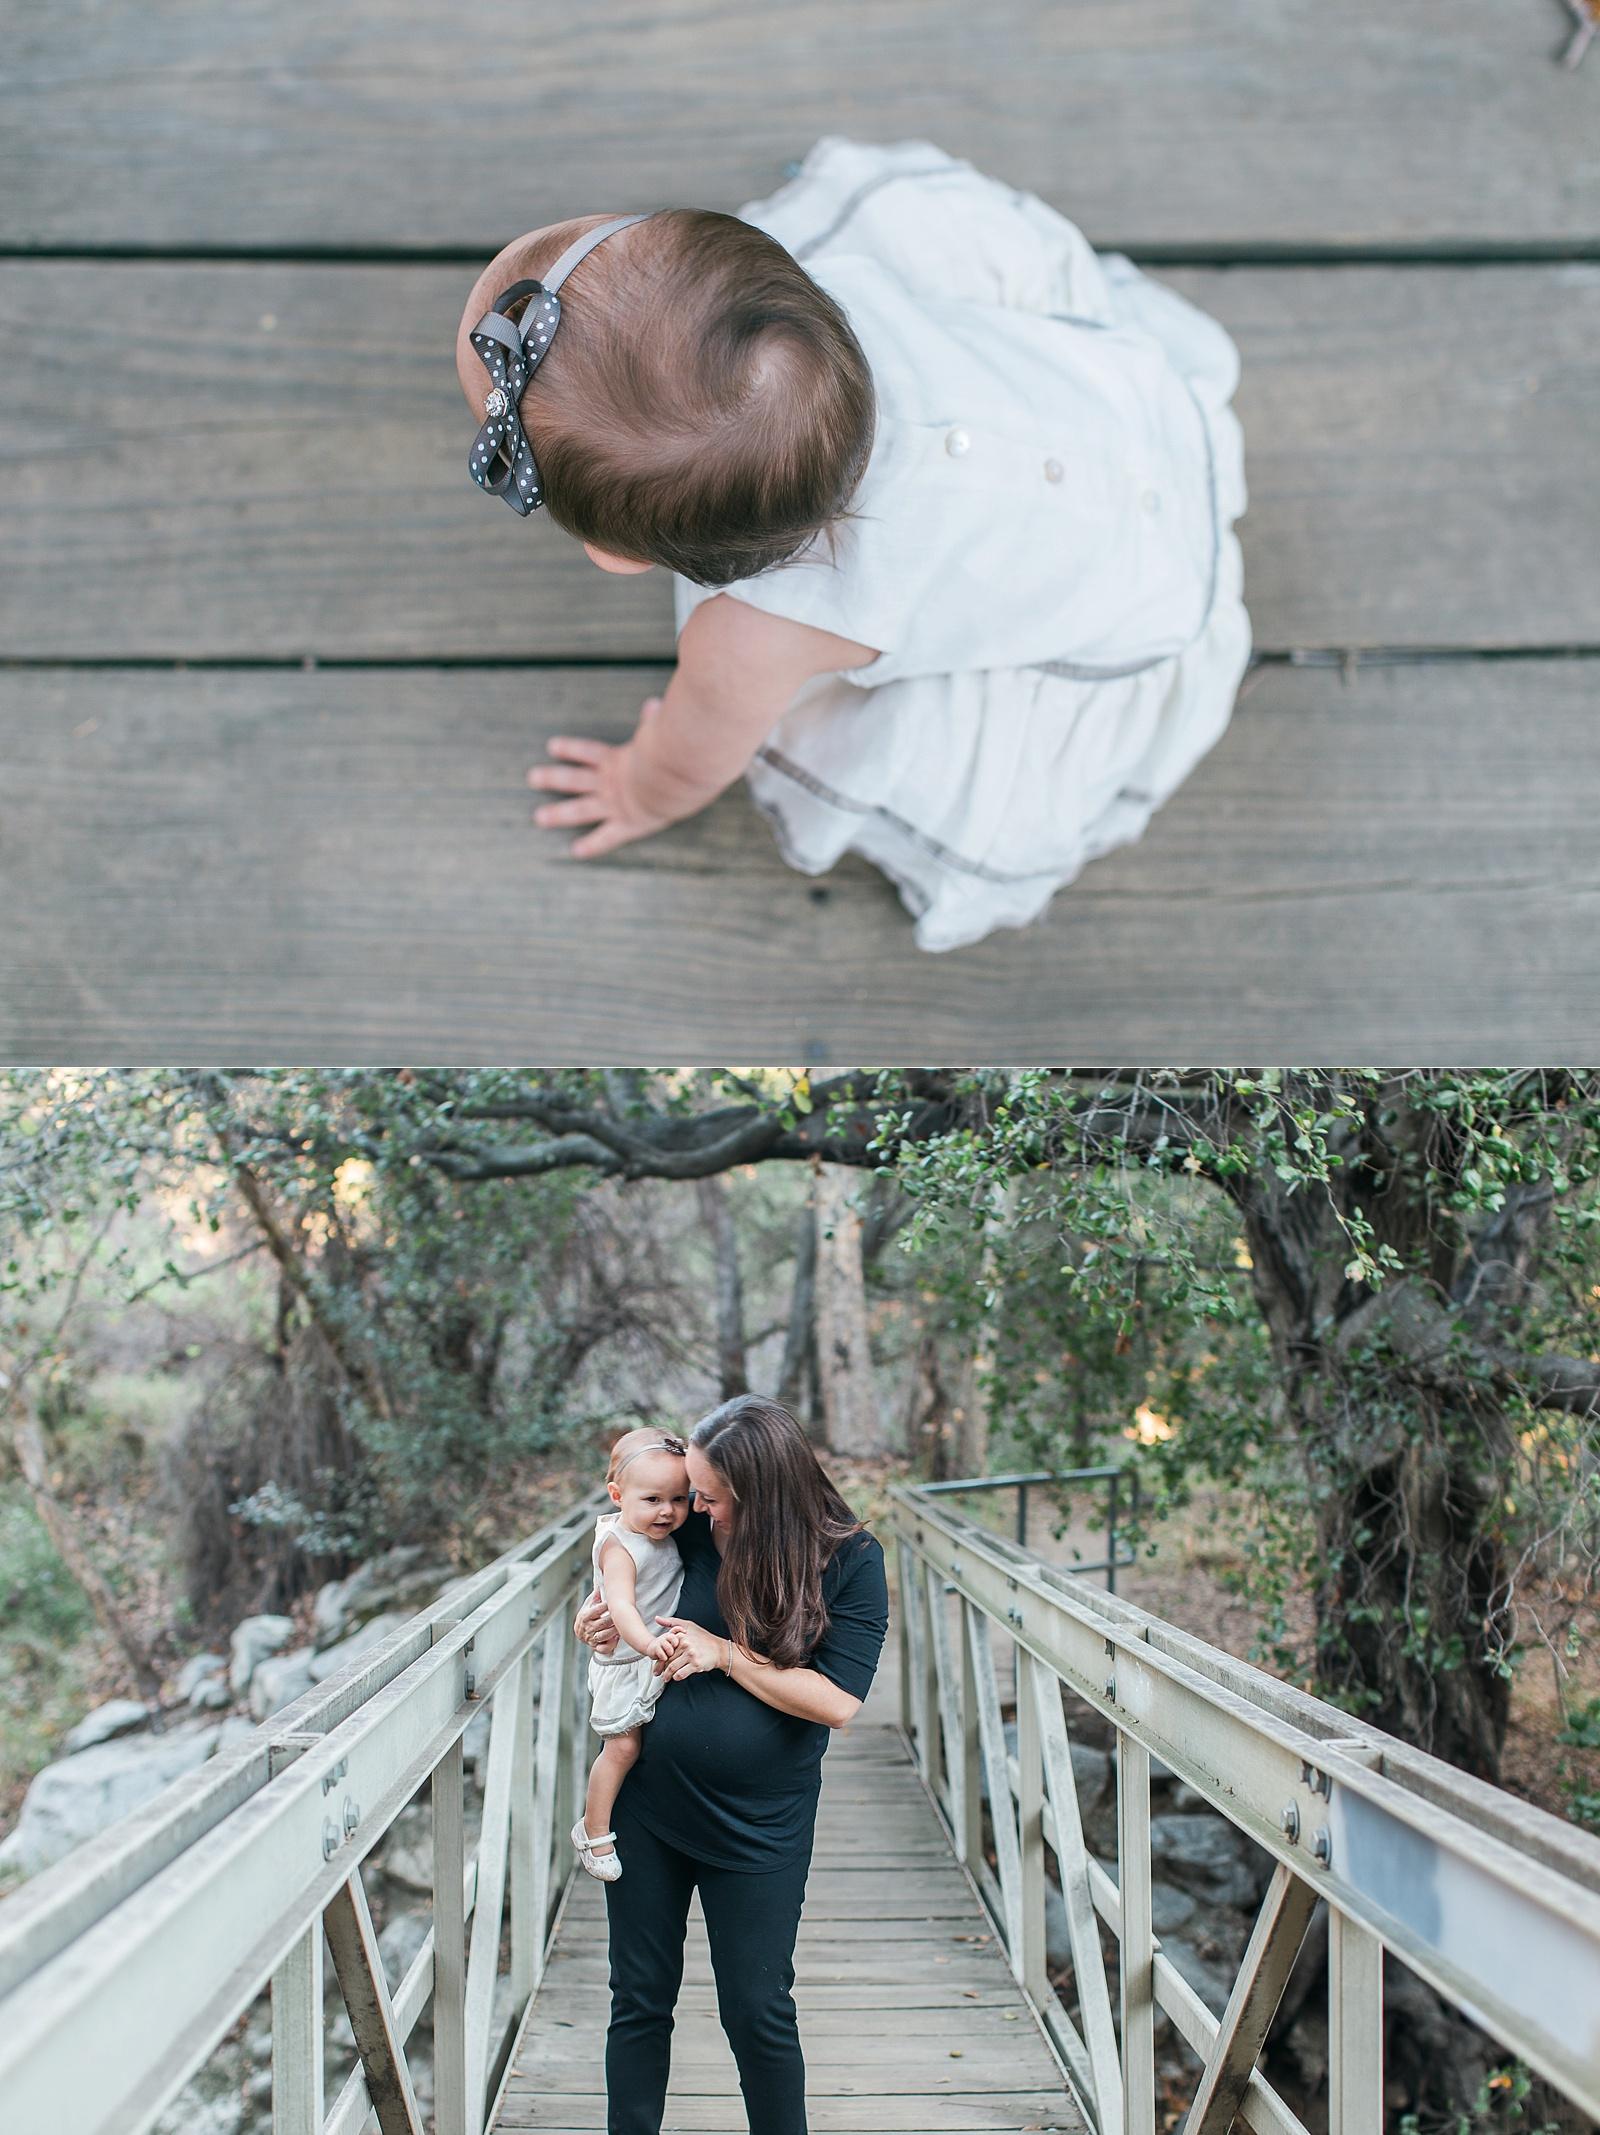 KristenLynettePhotography-print-6_web.jpg